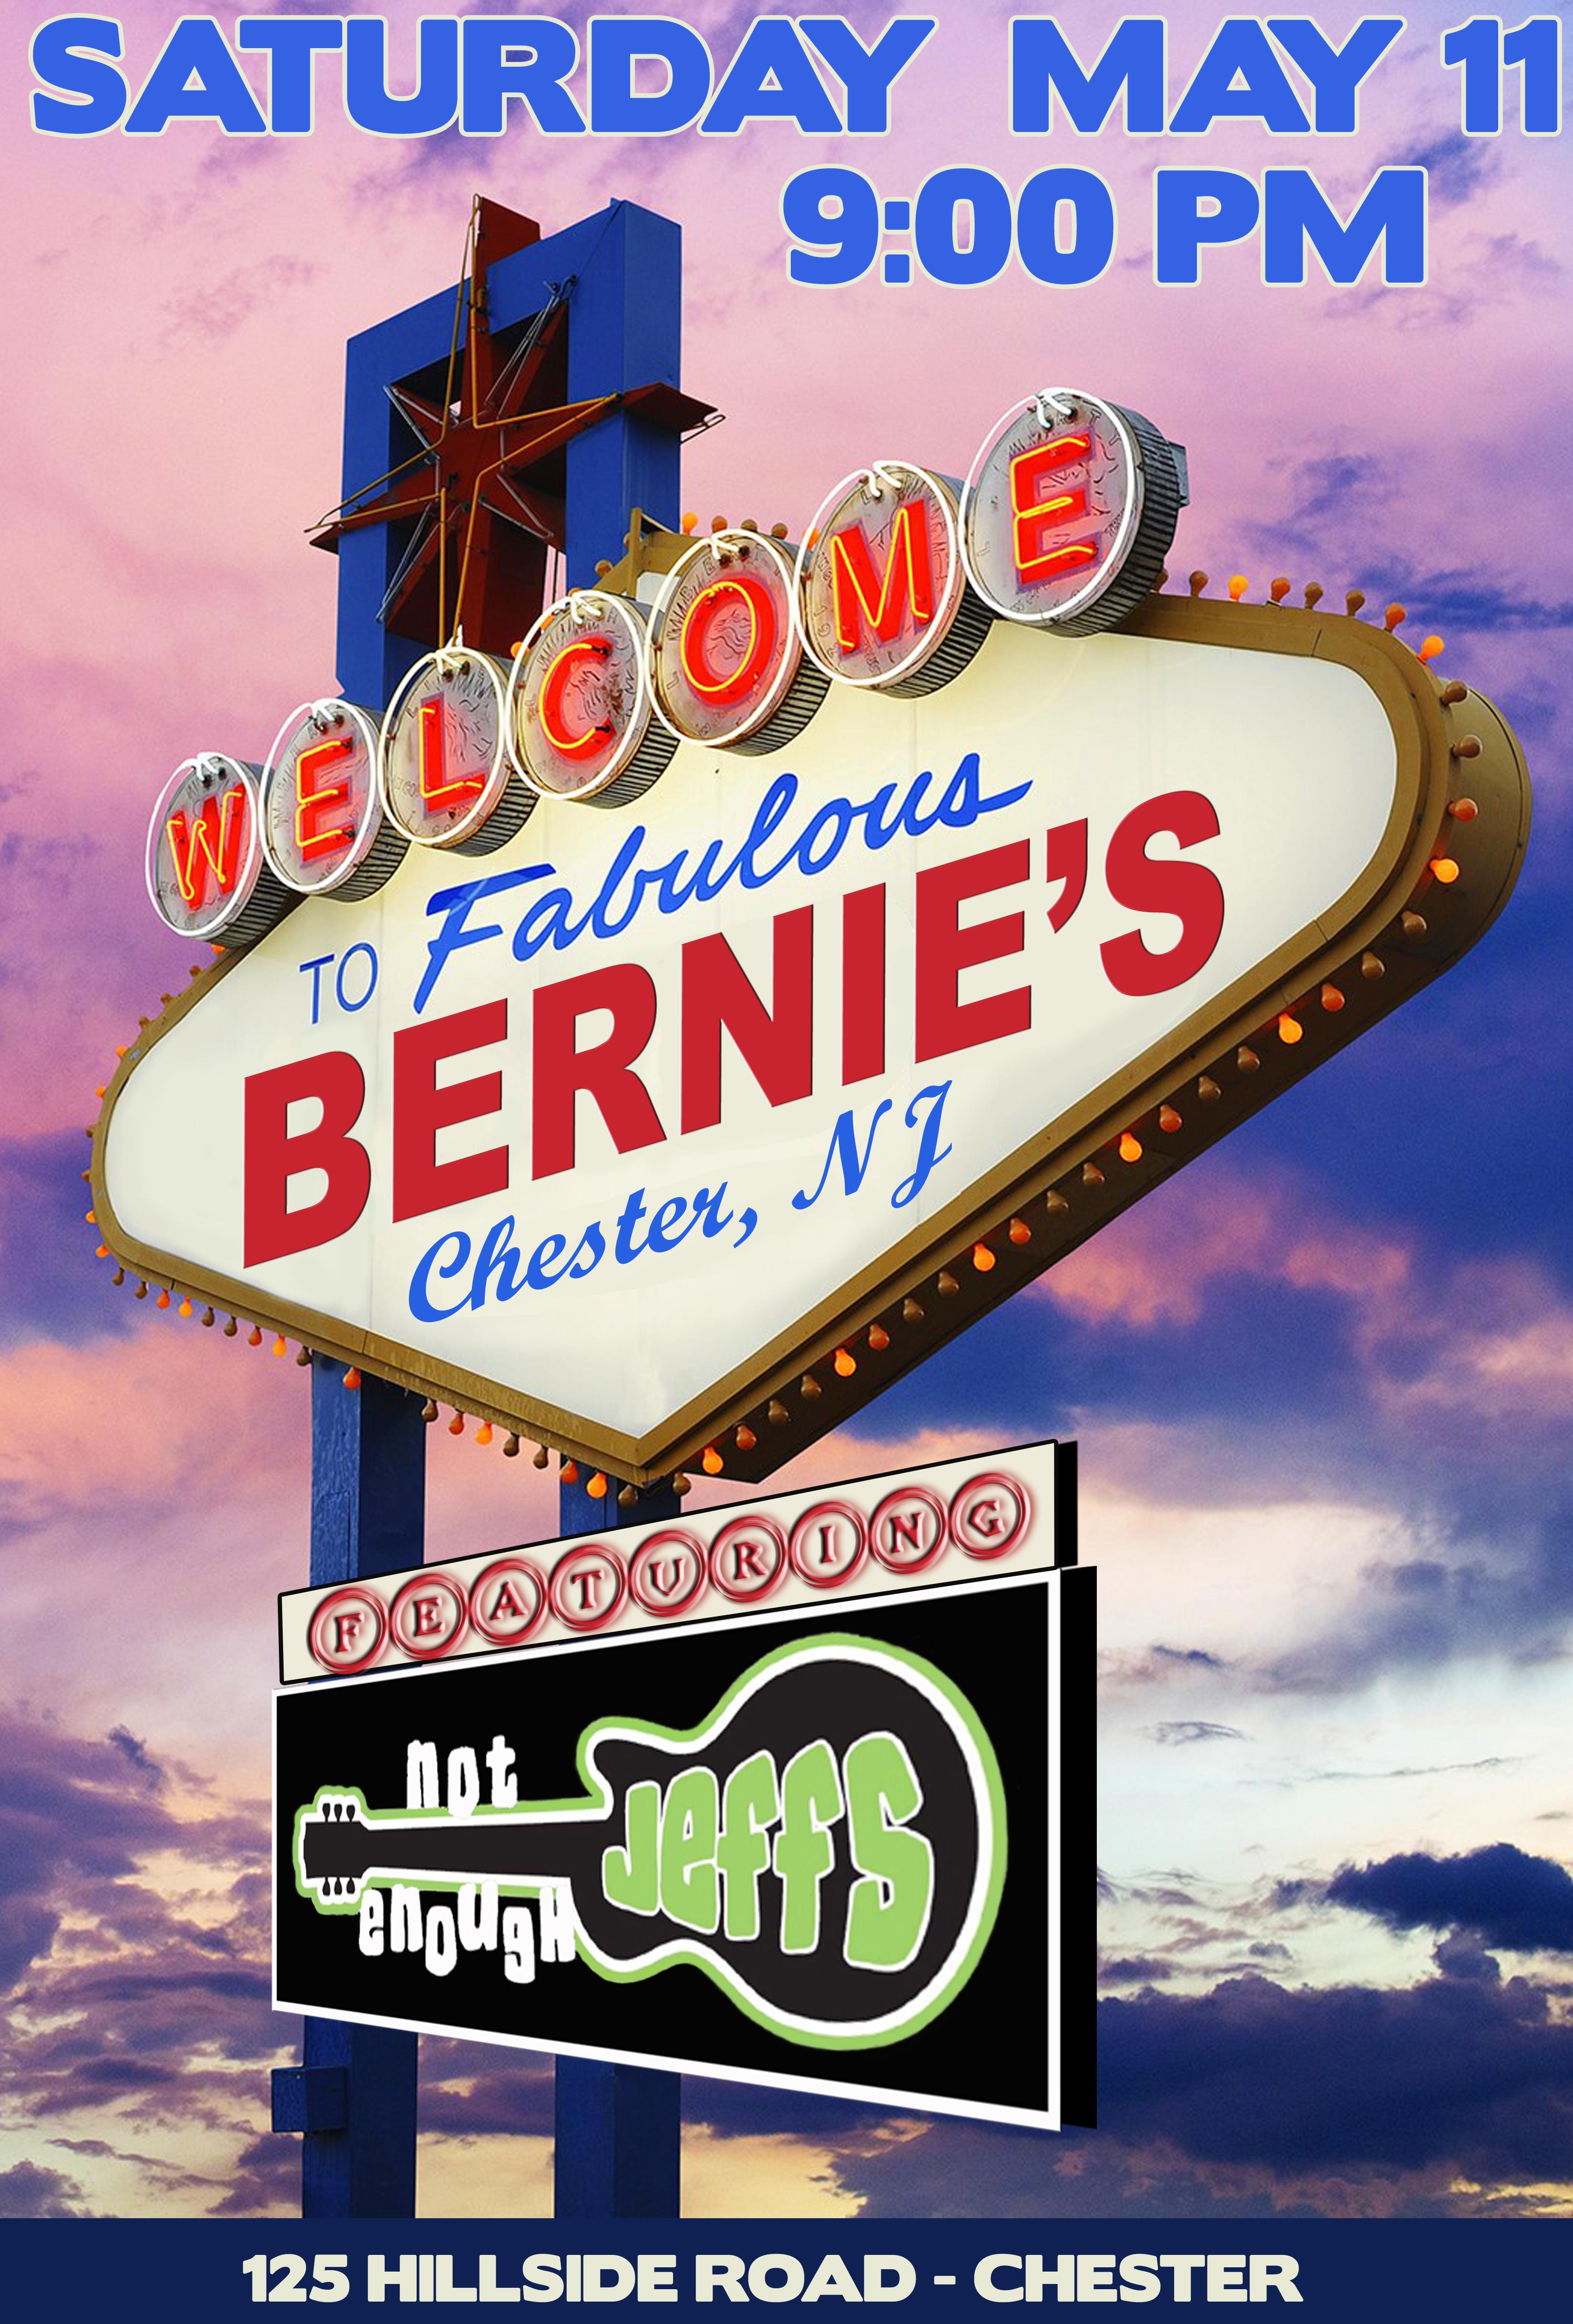 2019-04-09 Bernies2